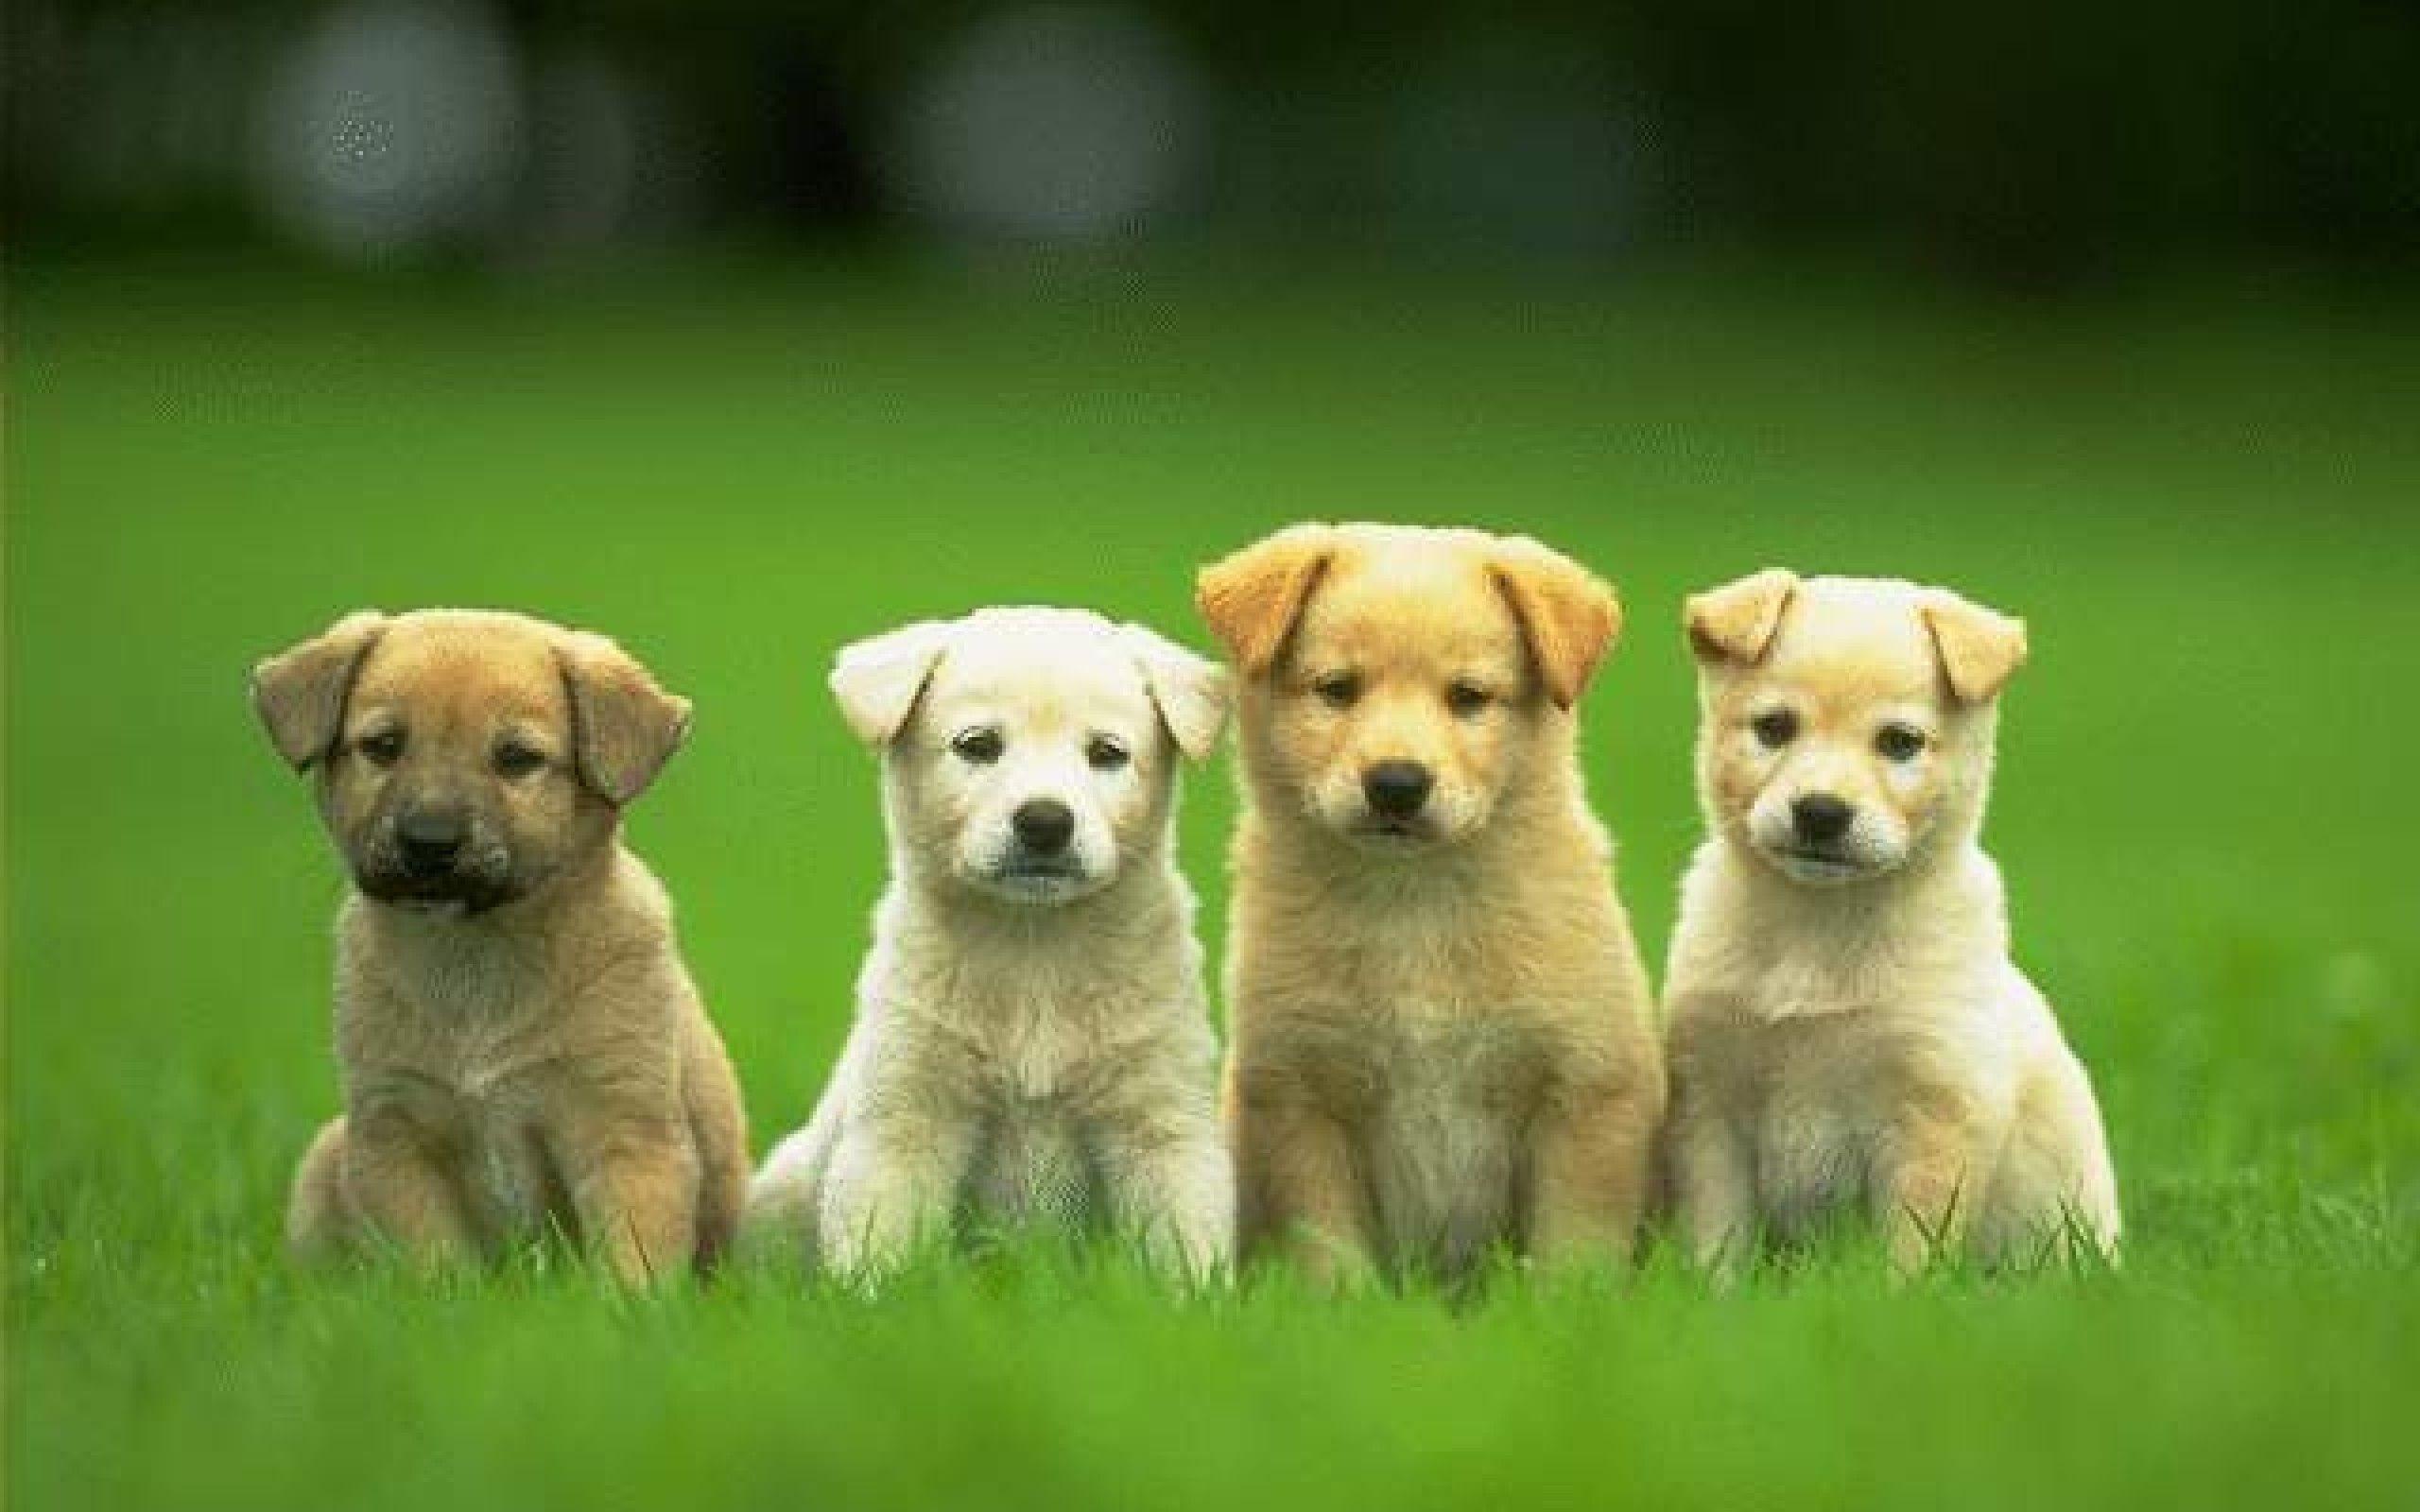 Four Cute Puppy Dog Wallpaper HD Wallpaper Backgrounds Tumblr .